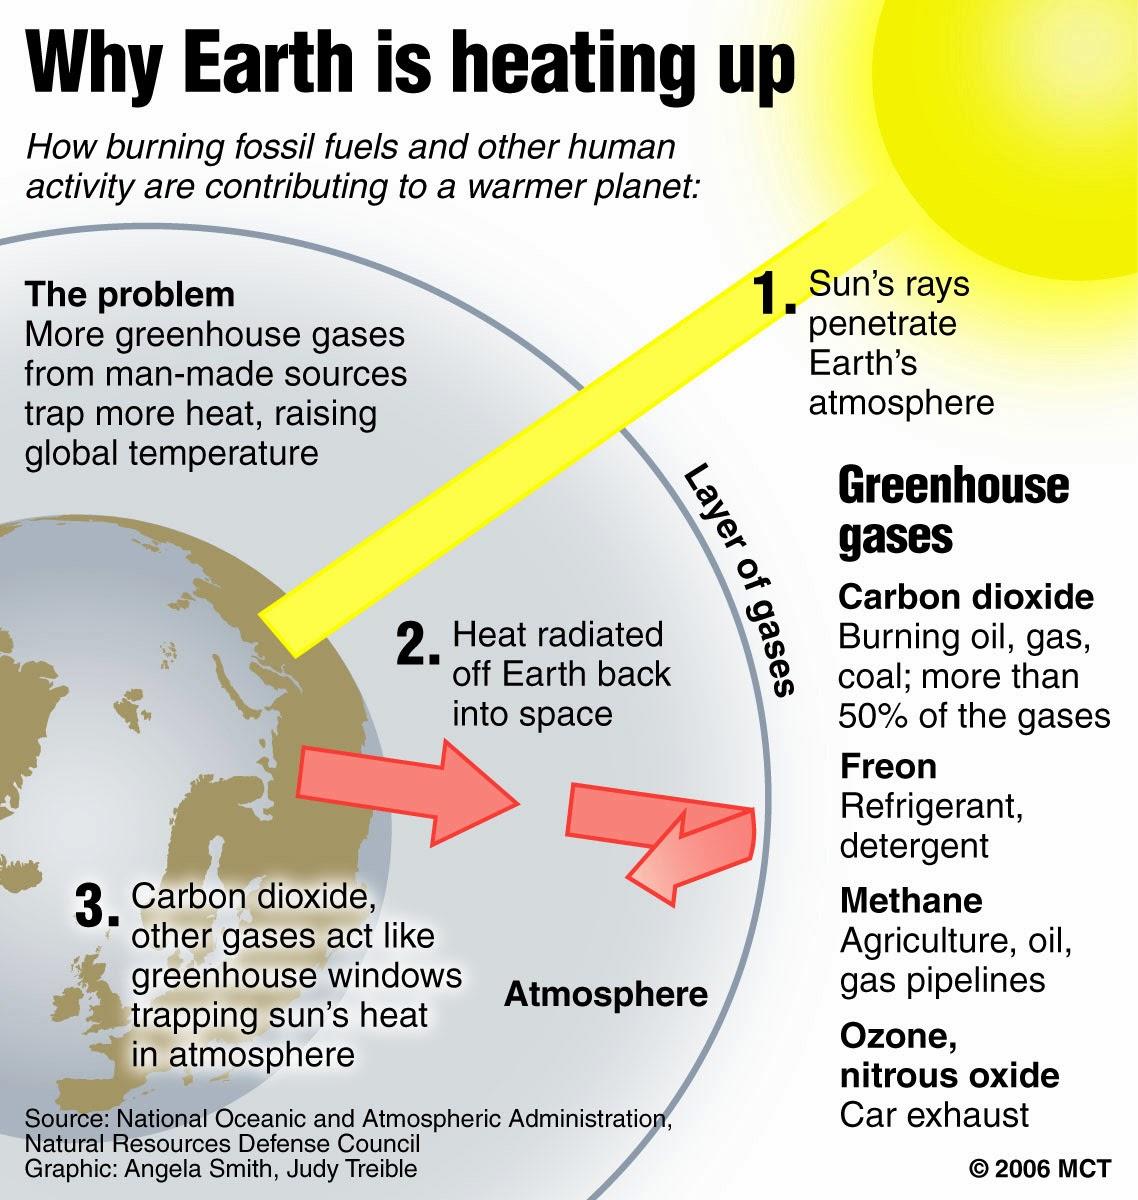 Mbhs Biochem 10th Grade Global Warming And Human Impacts